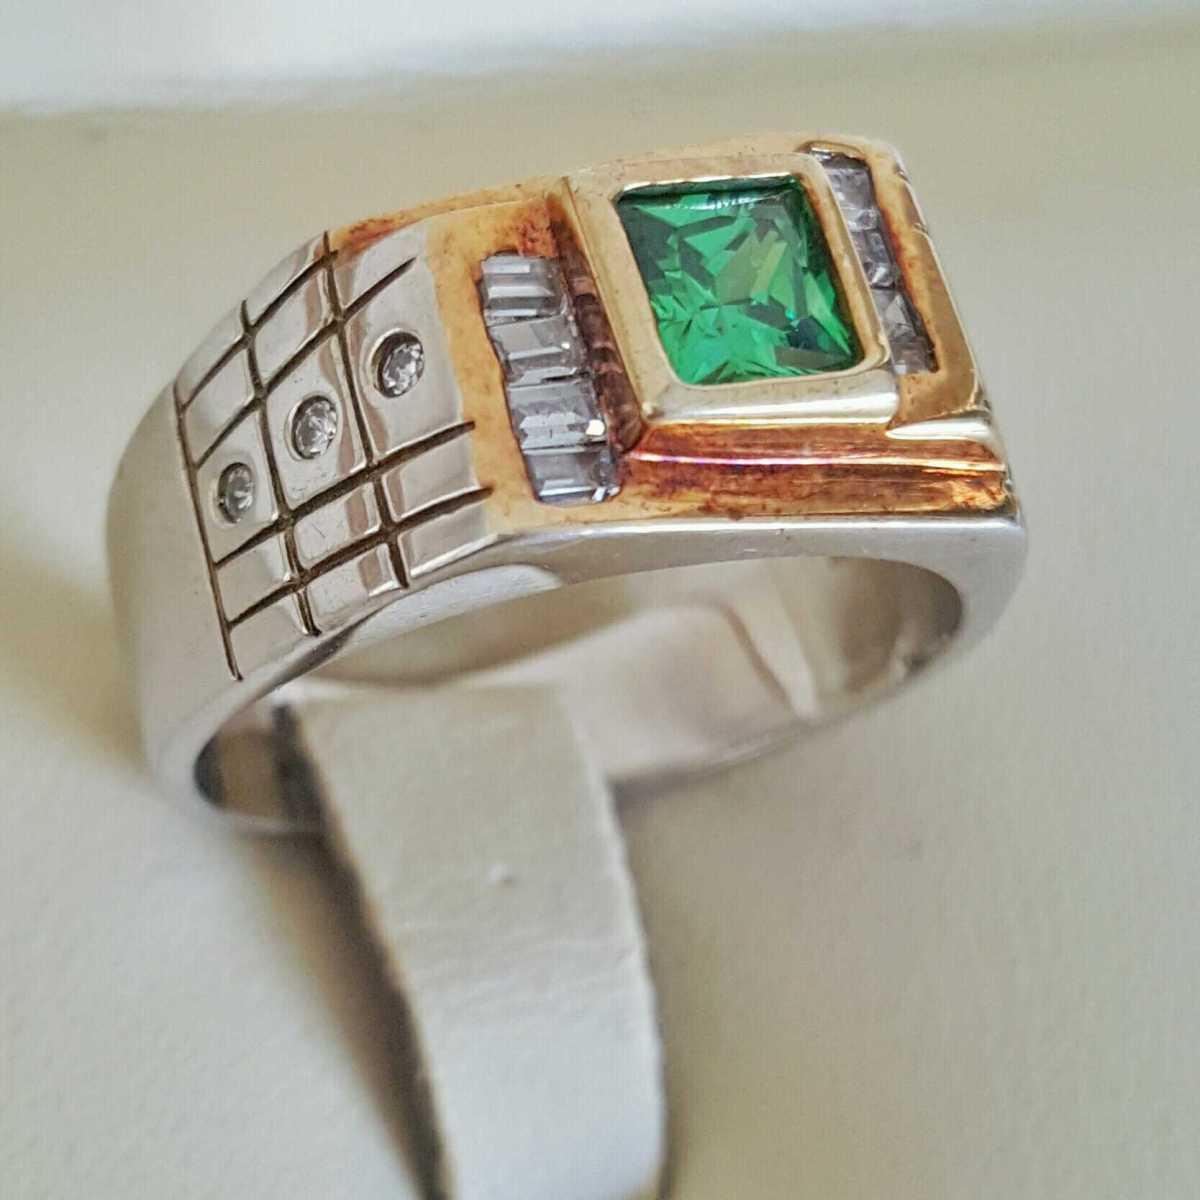 Real Silver 925 Jewellery Buy in Pakistan 46 natural gemstones pakistan + 925 silver jewelry online